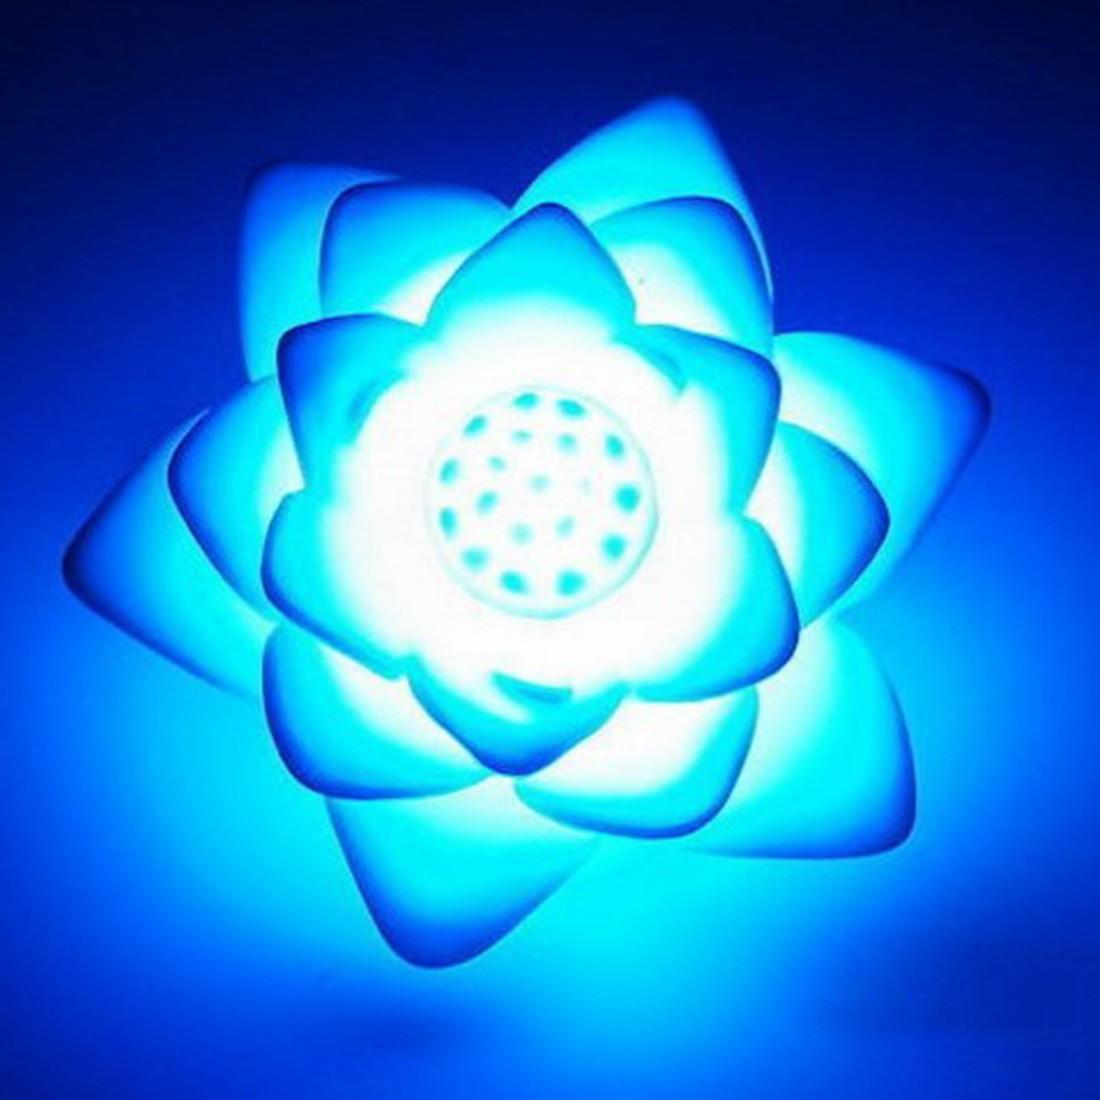 Romantic Lotus Flower Night Light Color Changing Lotus Flower LED Night Light Romantic Love Mood Lamp Decoration Top Quality